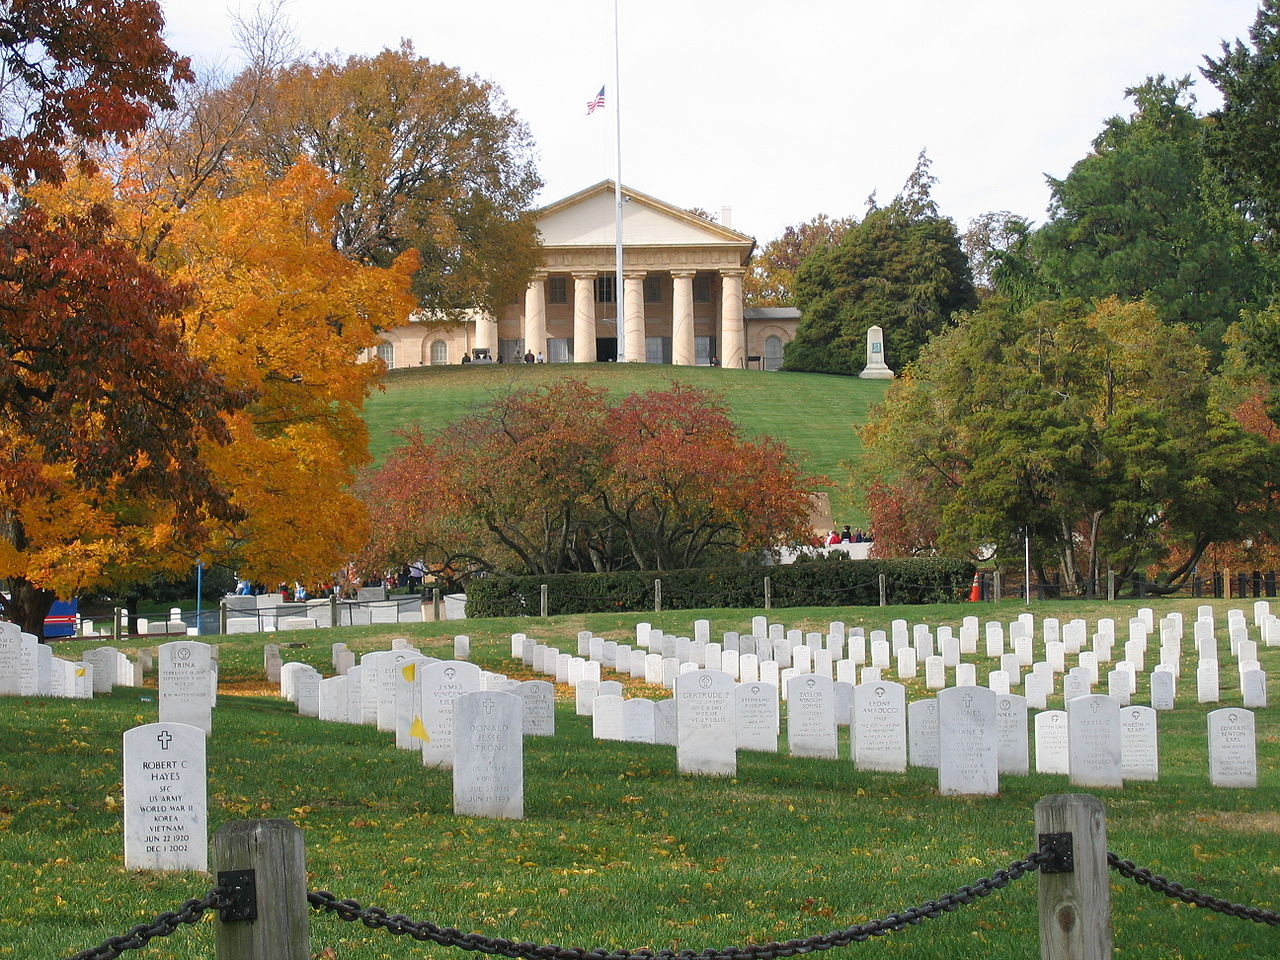 https://upload.wikimedia.org/wikipedia/commons/thumb/7/79/Arlington_House.jpg/1280px-Arlington_House.jpg